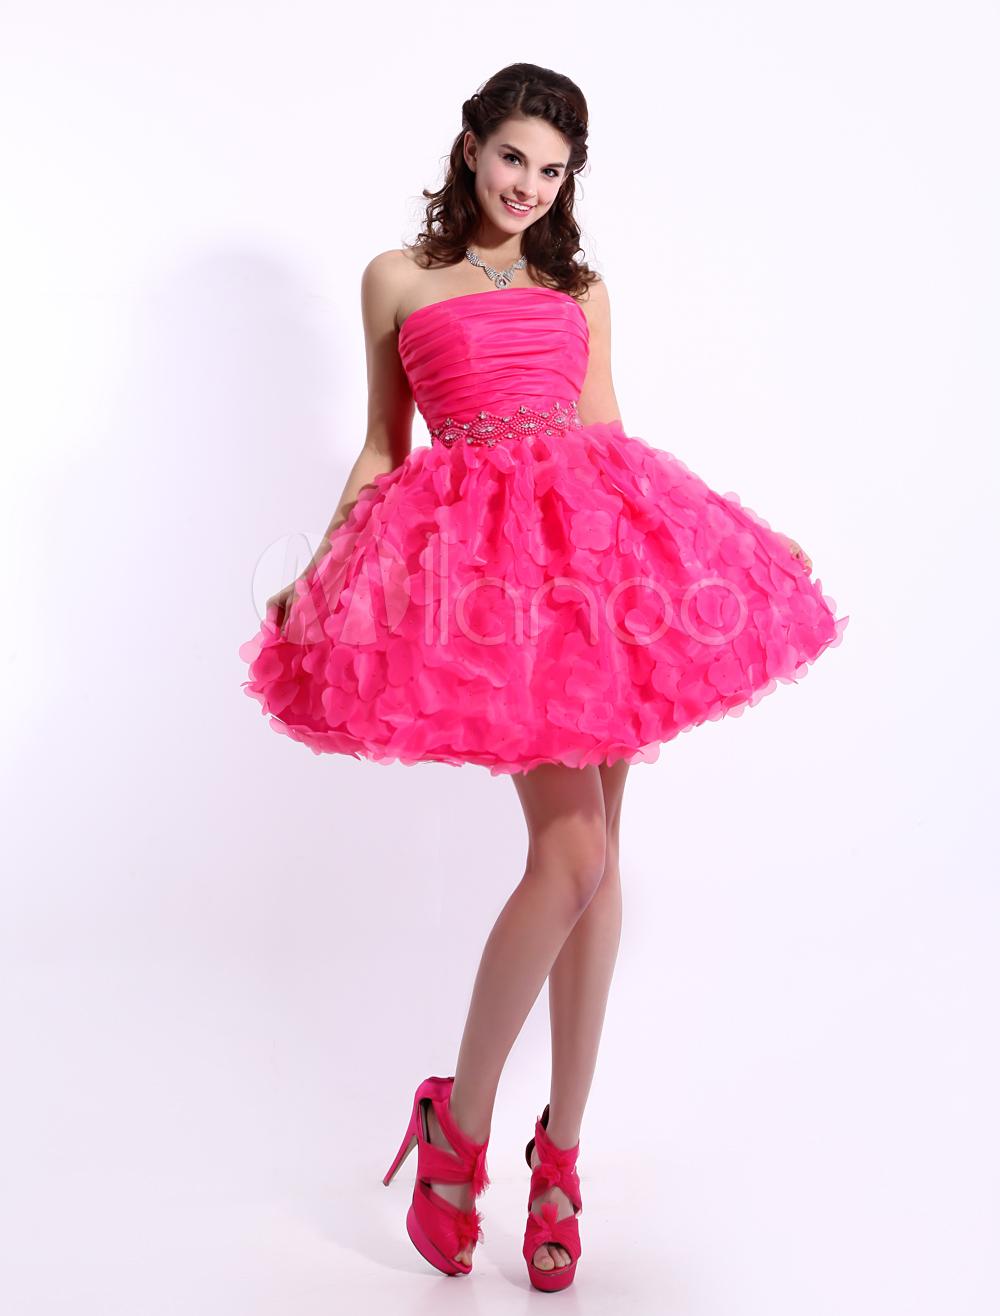 Fuchsia Strapless Mini Homecoming Dress with Ruffled Skirt - Milanoo.com